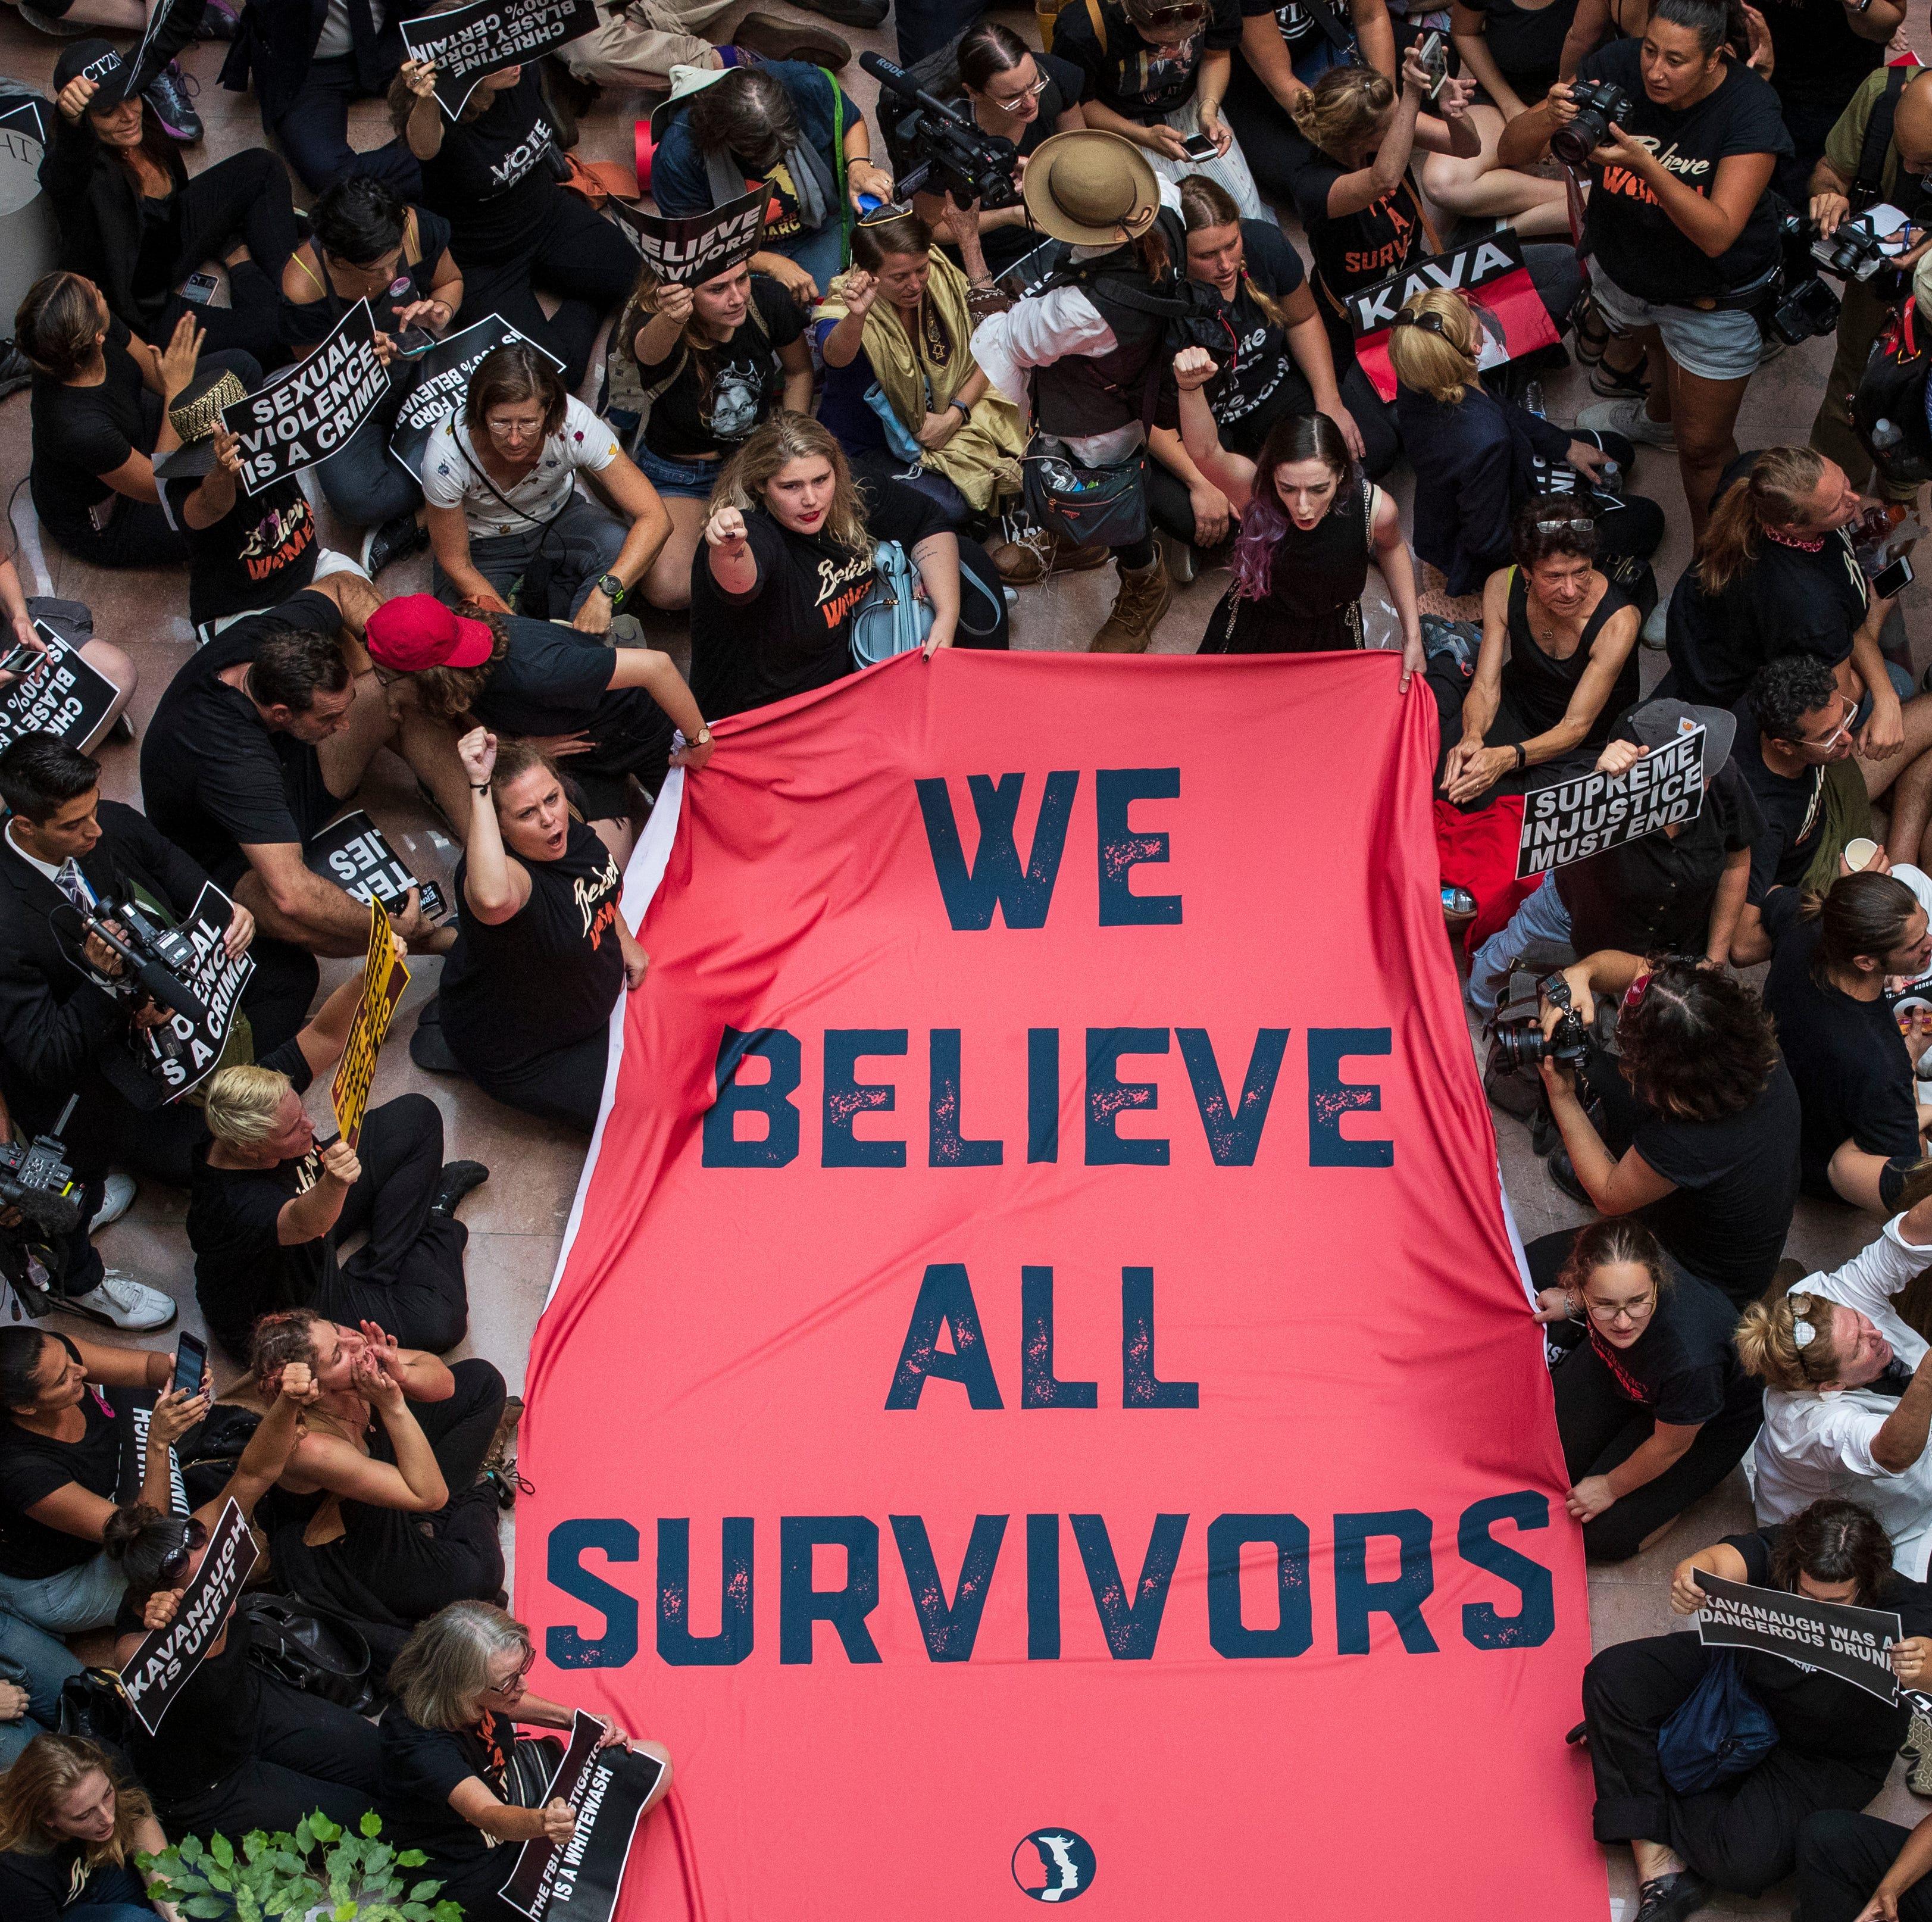 Letter: Global distrust will negatively impact survivors